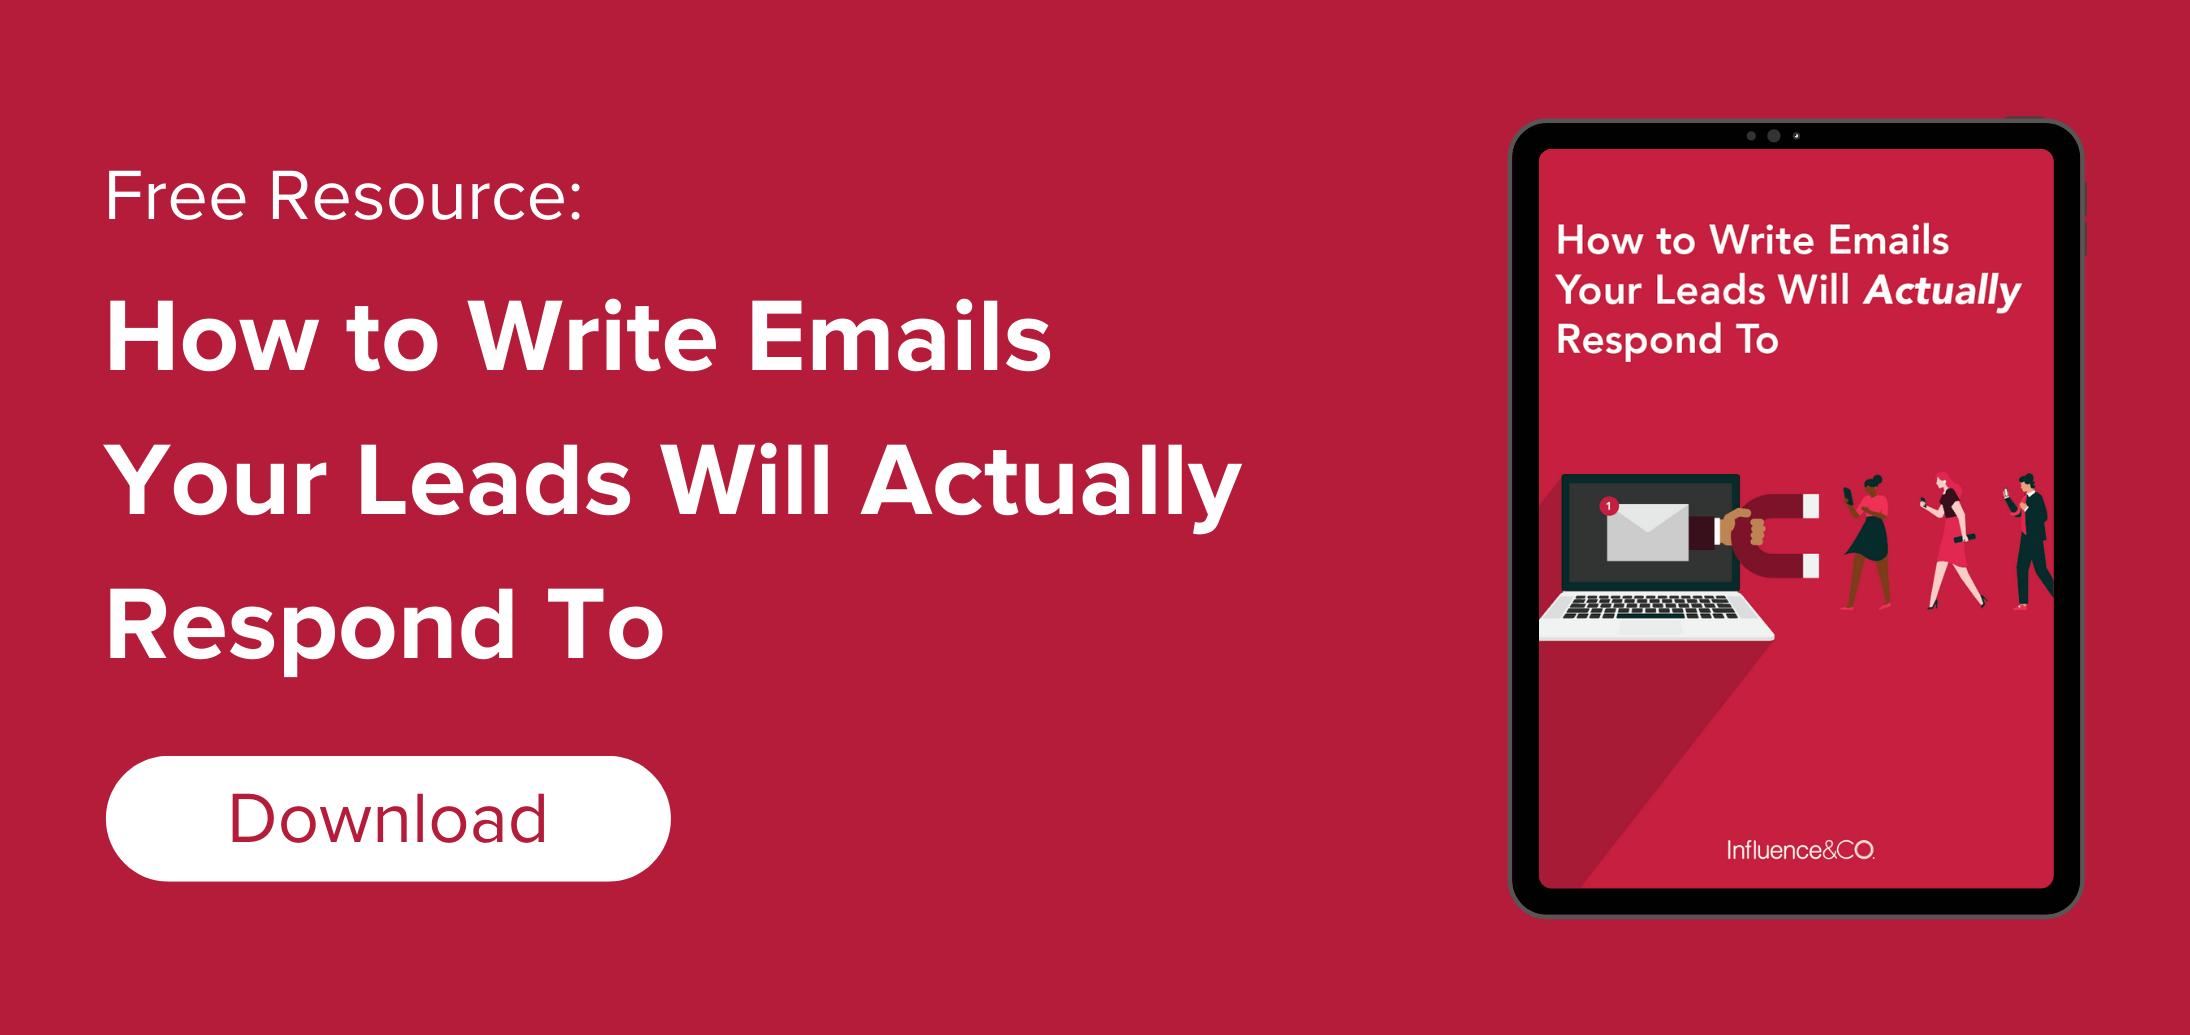 write-emails-leads-respond-to-cta